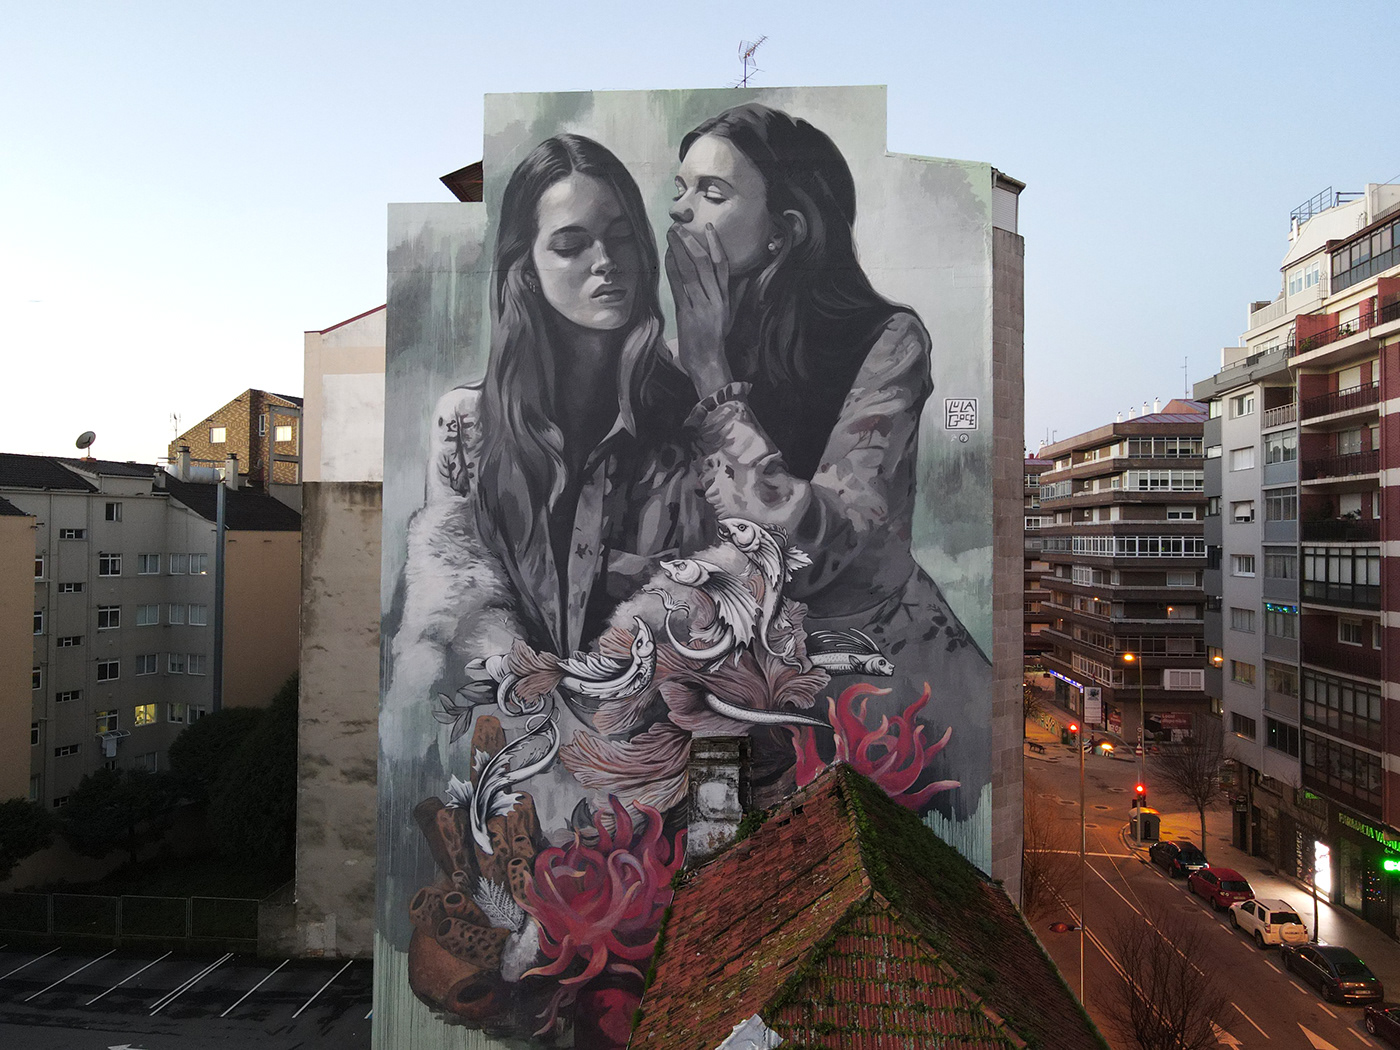 Lula Goce Mural Street Art  streetartist urban art arquitectura arte urbano Graffiti photo